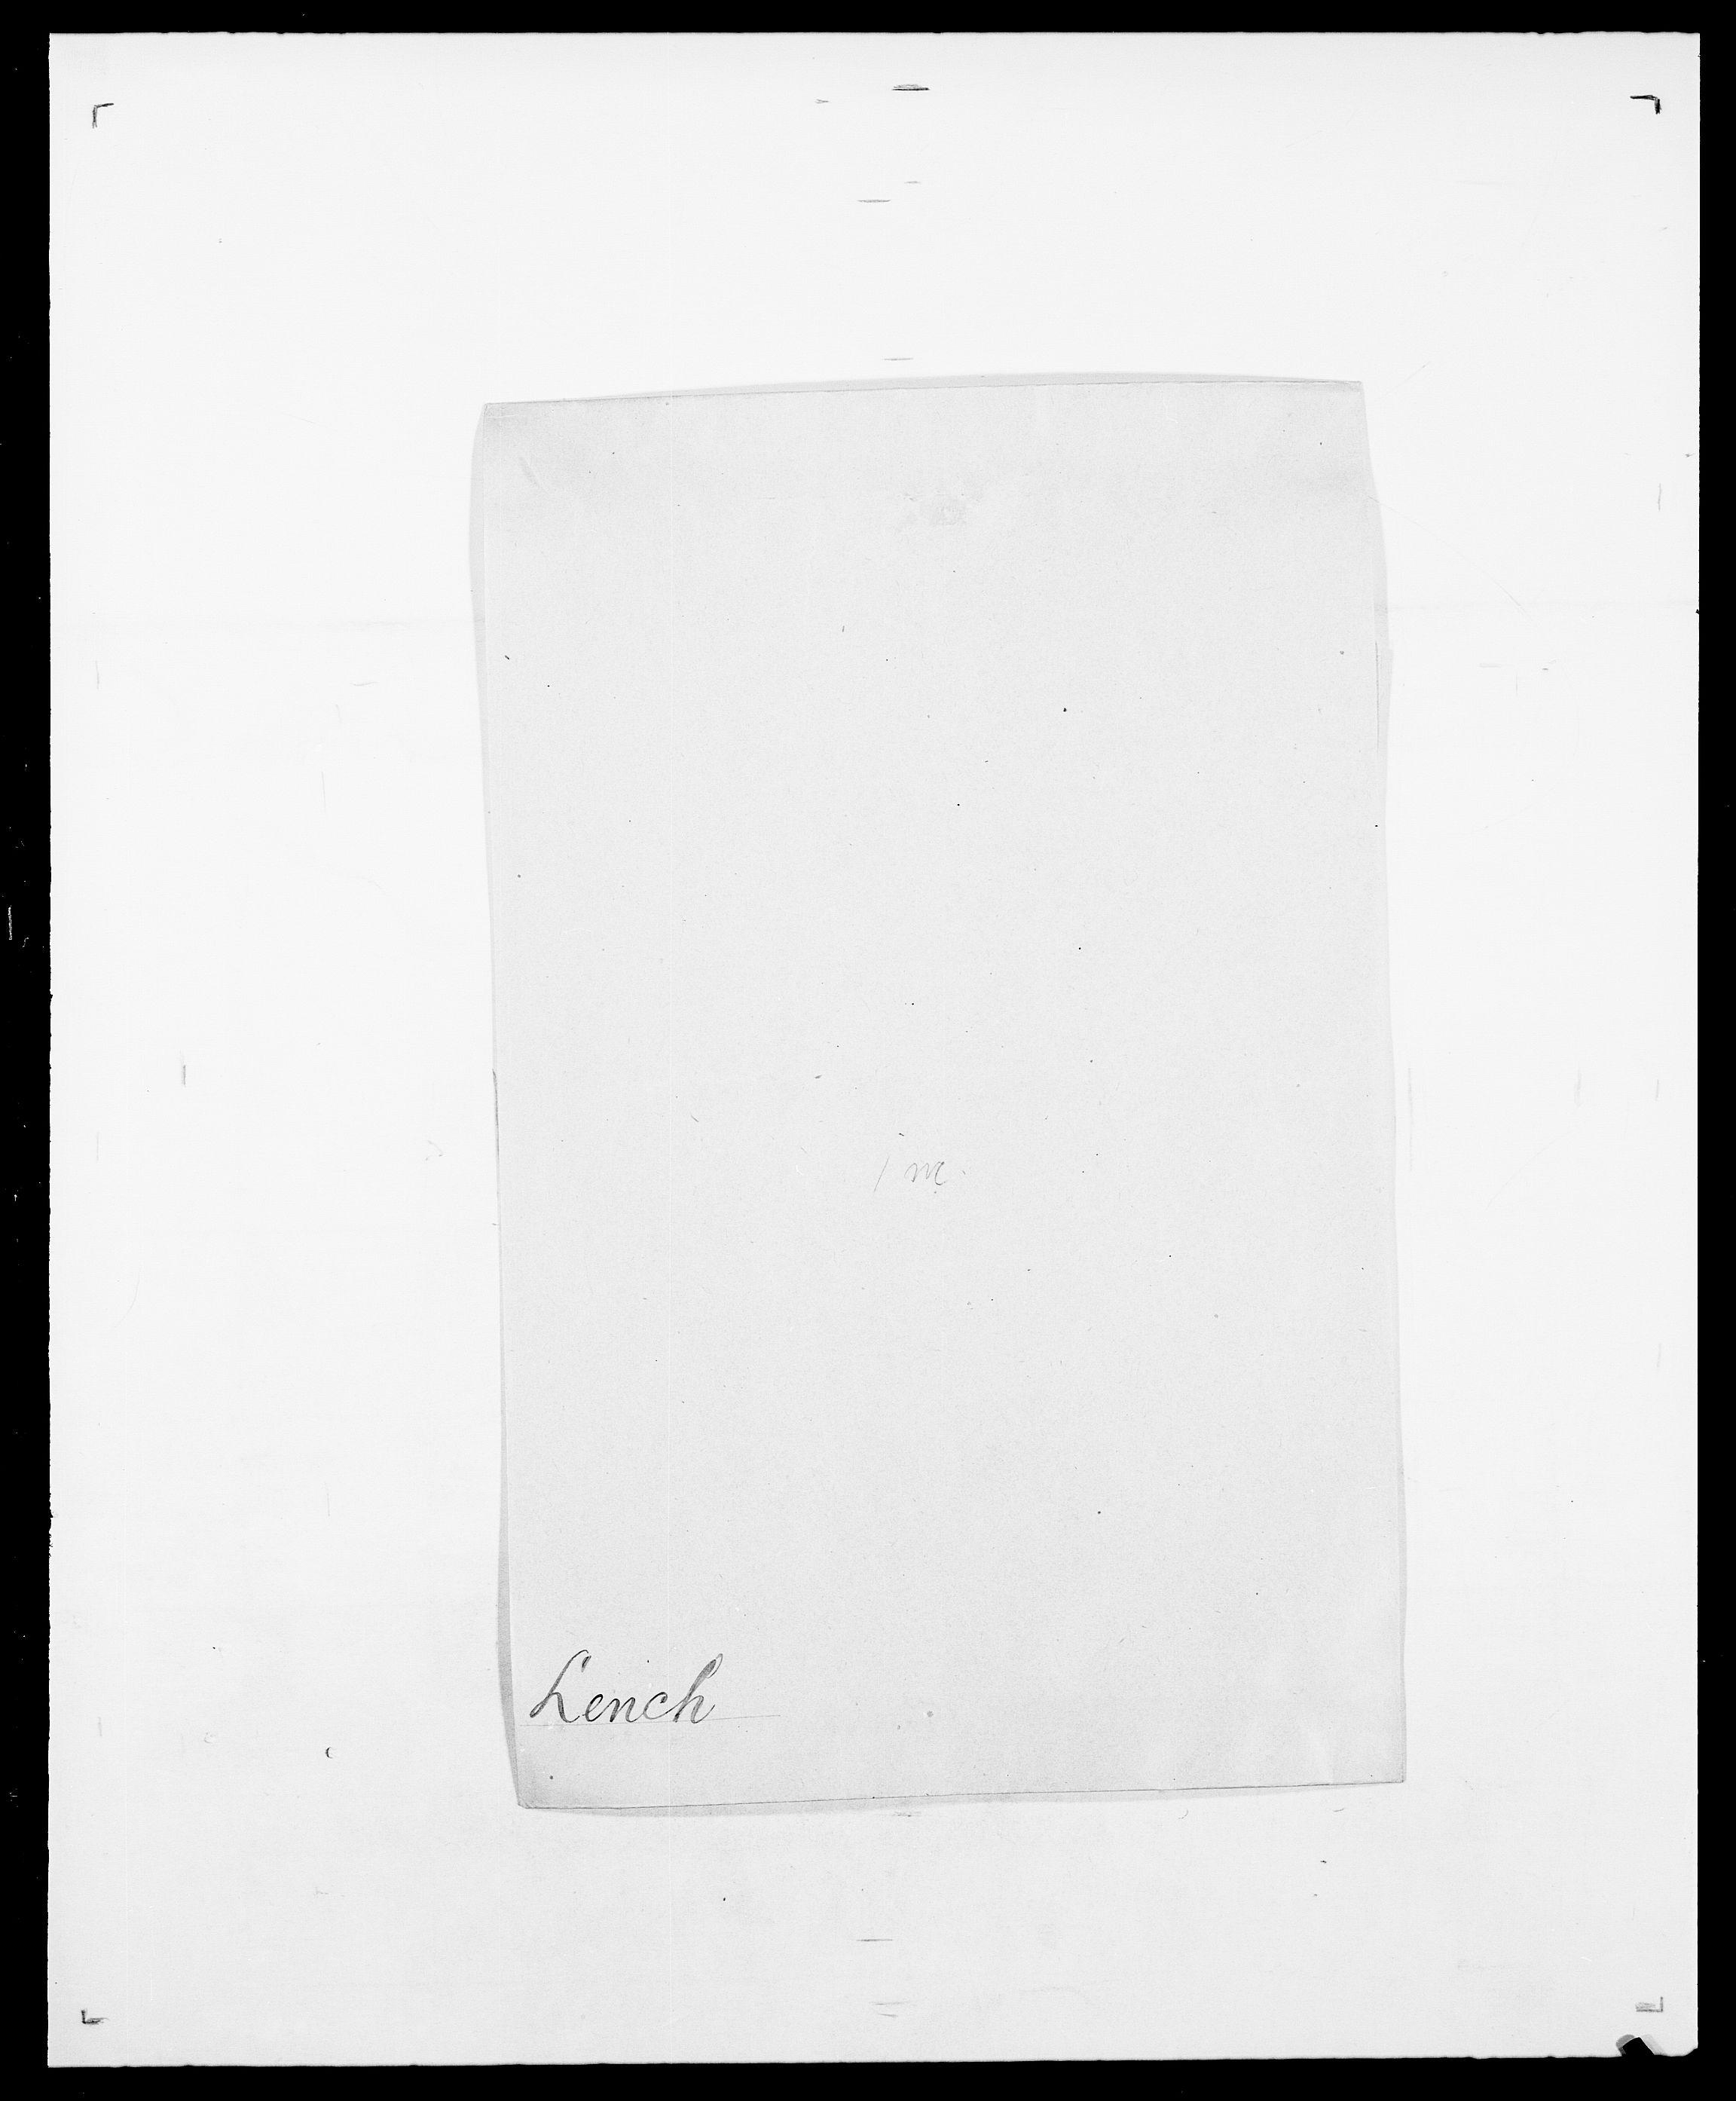 SAO, Delgobe, Charles Antoine - samling, D/Da/L0023: Lau - Lirvyn, s. 211